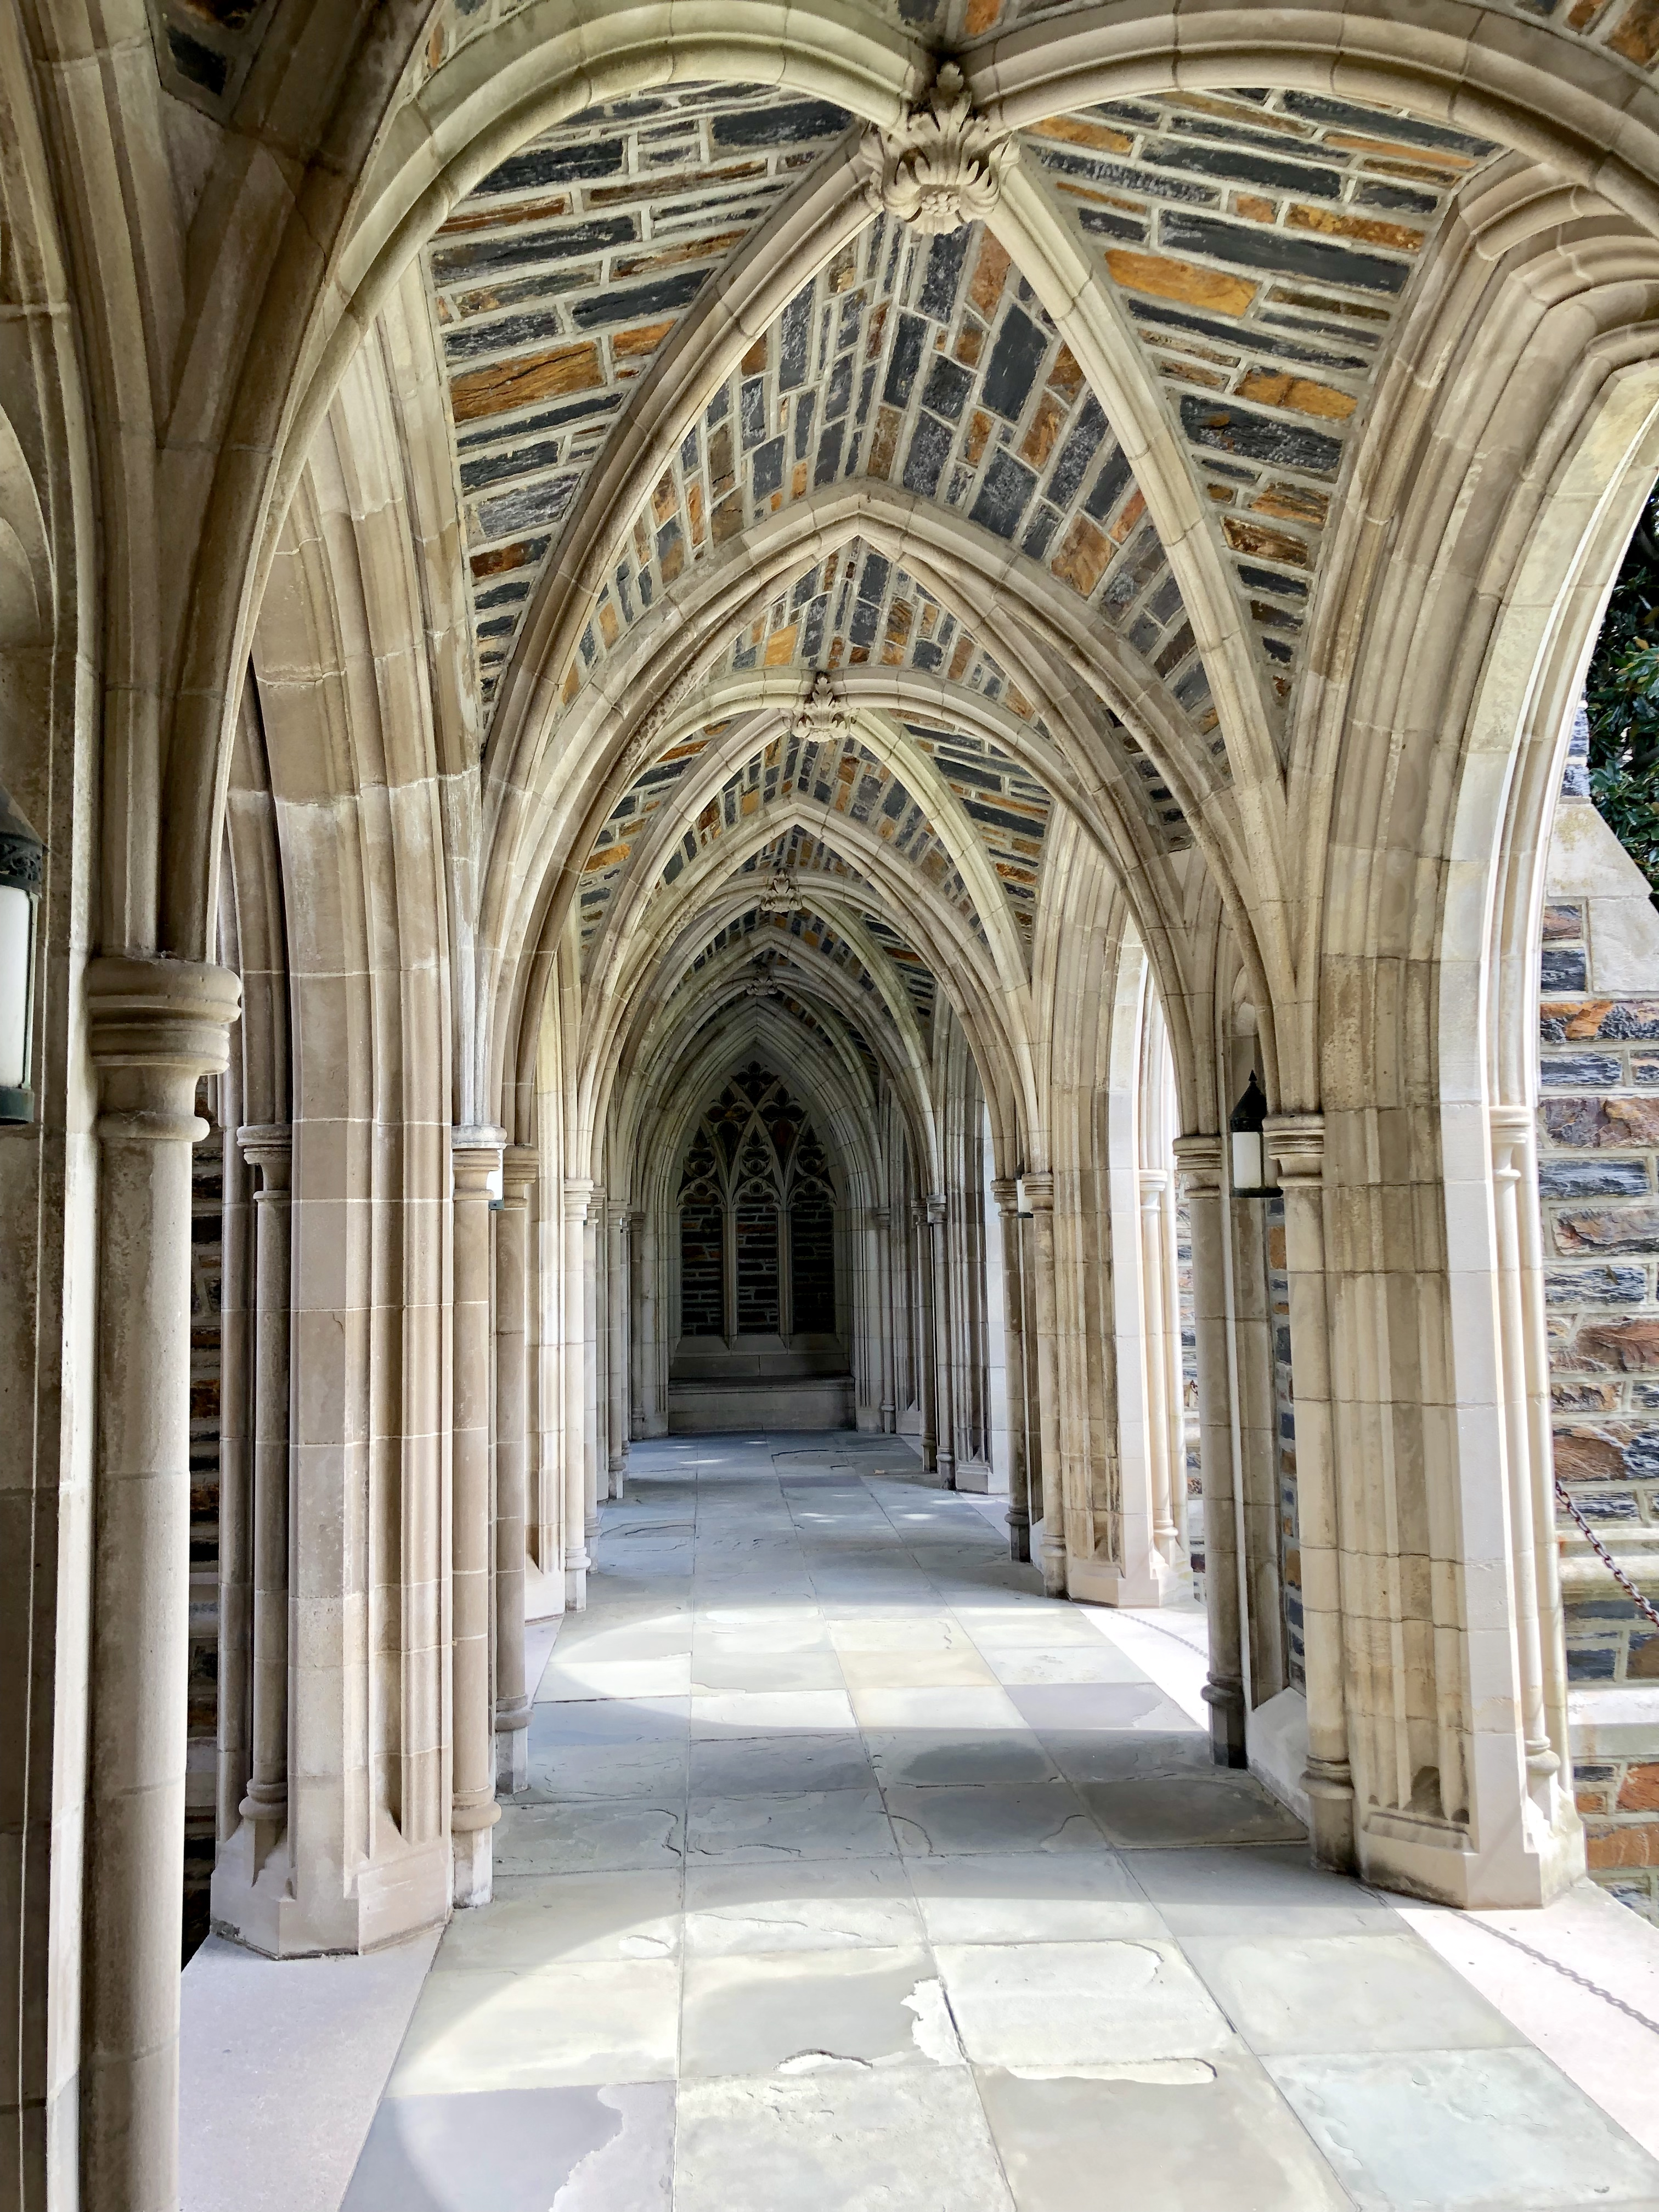 A cloister at the Duke Chapel, West Campus, Duke University, Durham, North Carolina, USA.